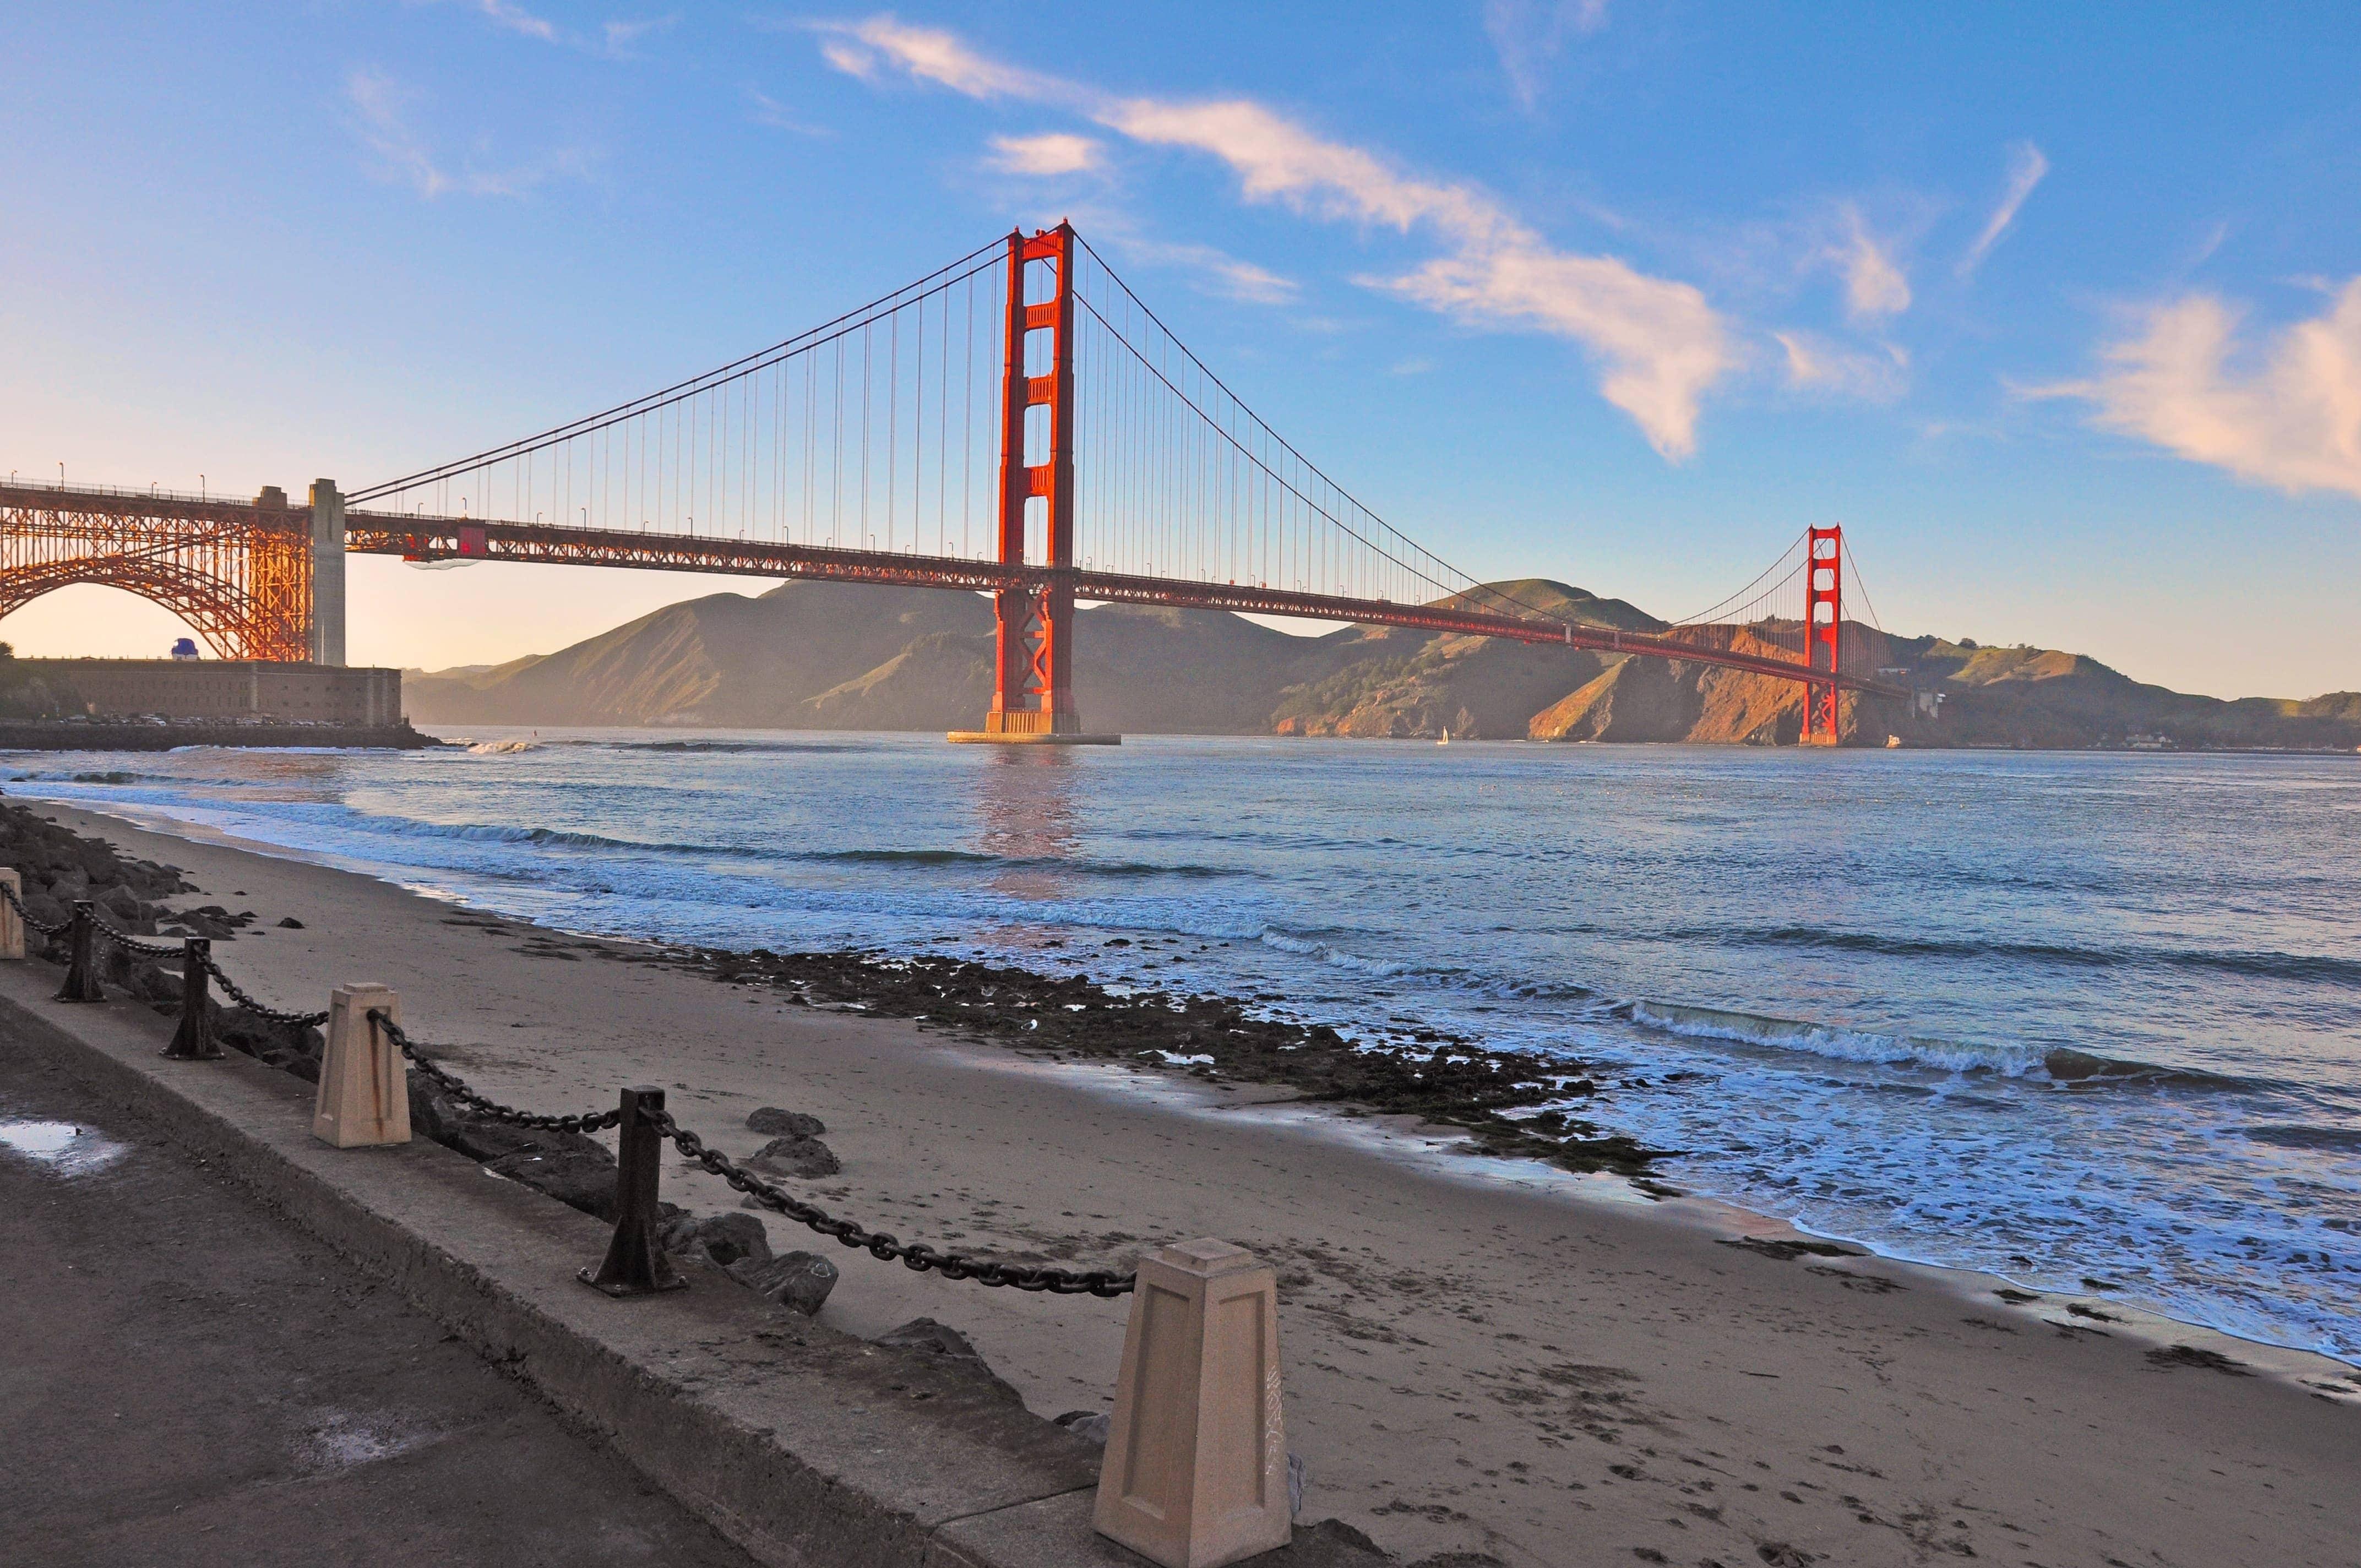 Bookworms Unite: Top Five Bookstores in San Francisco